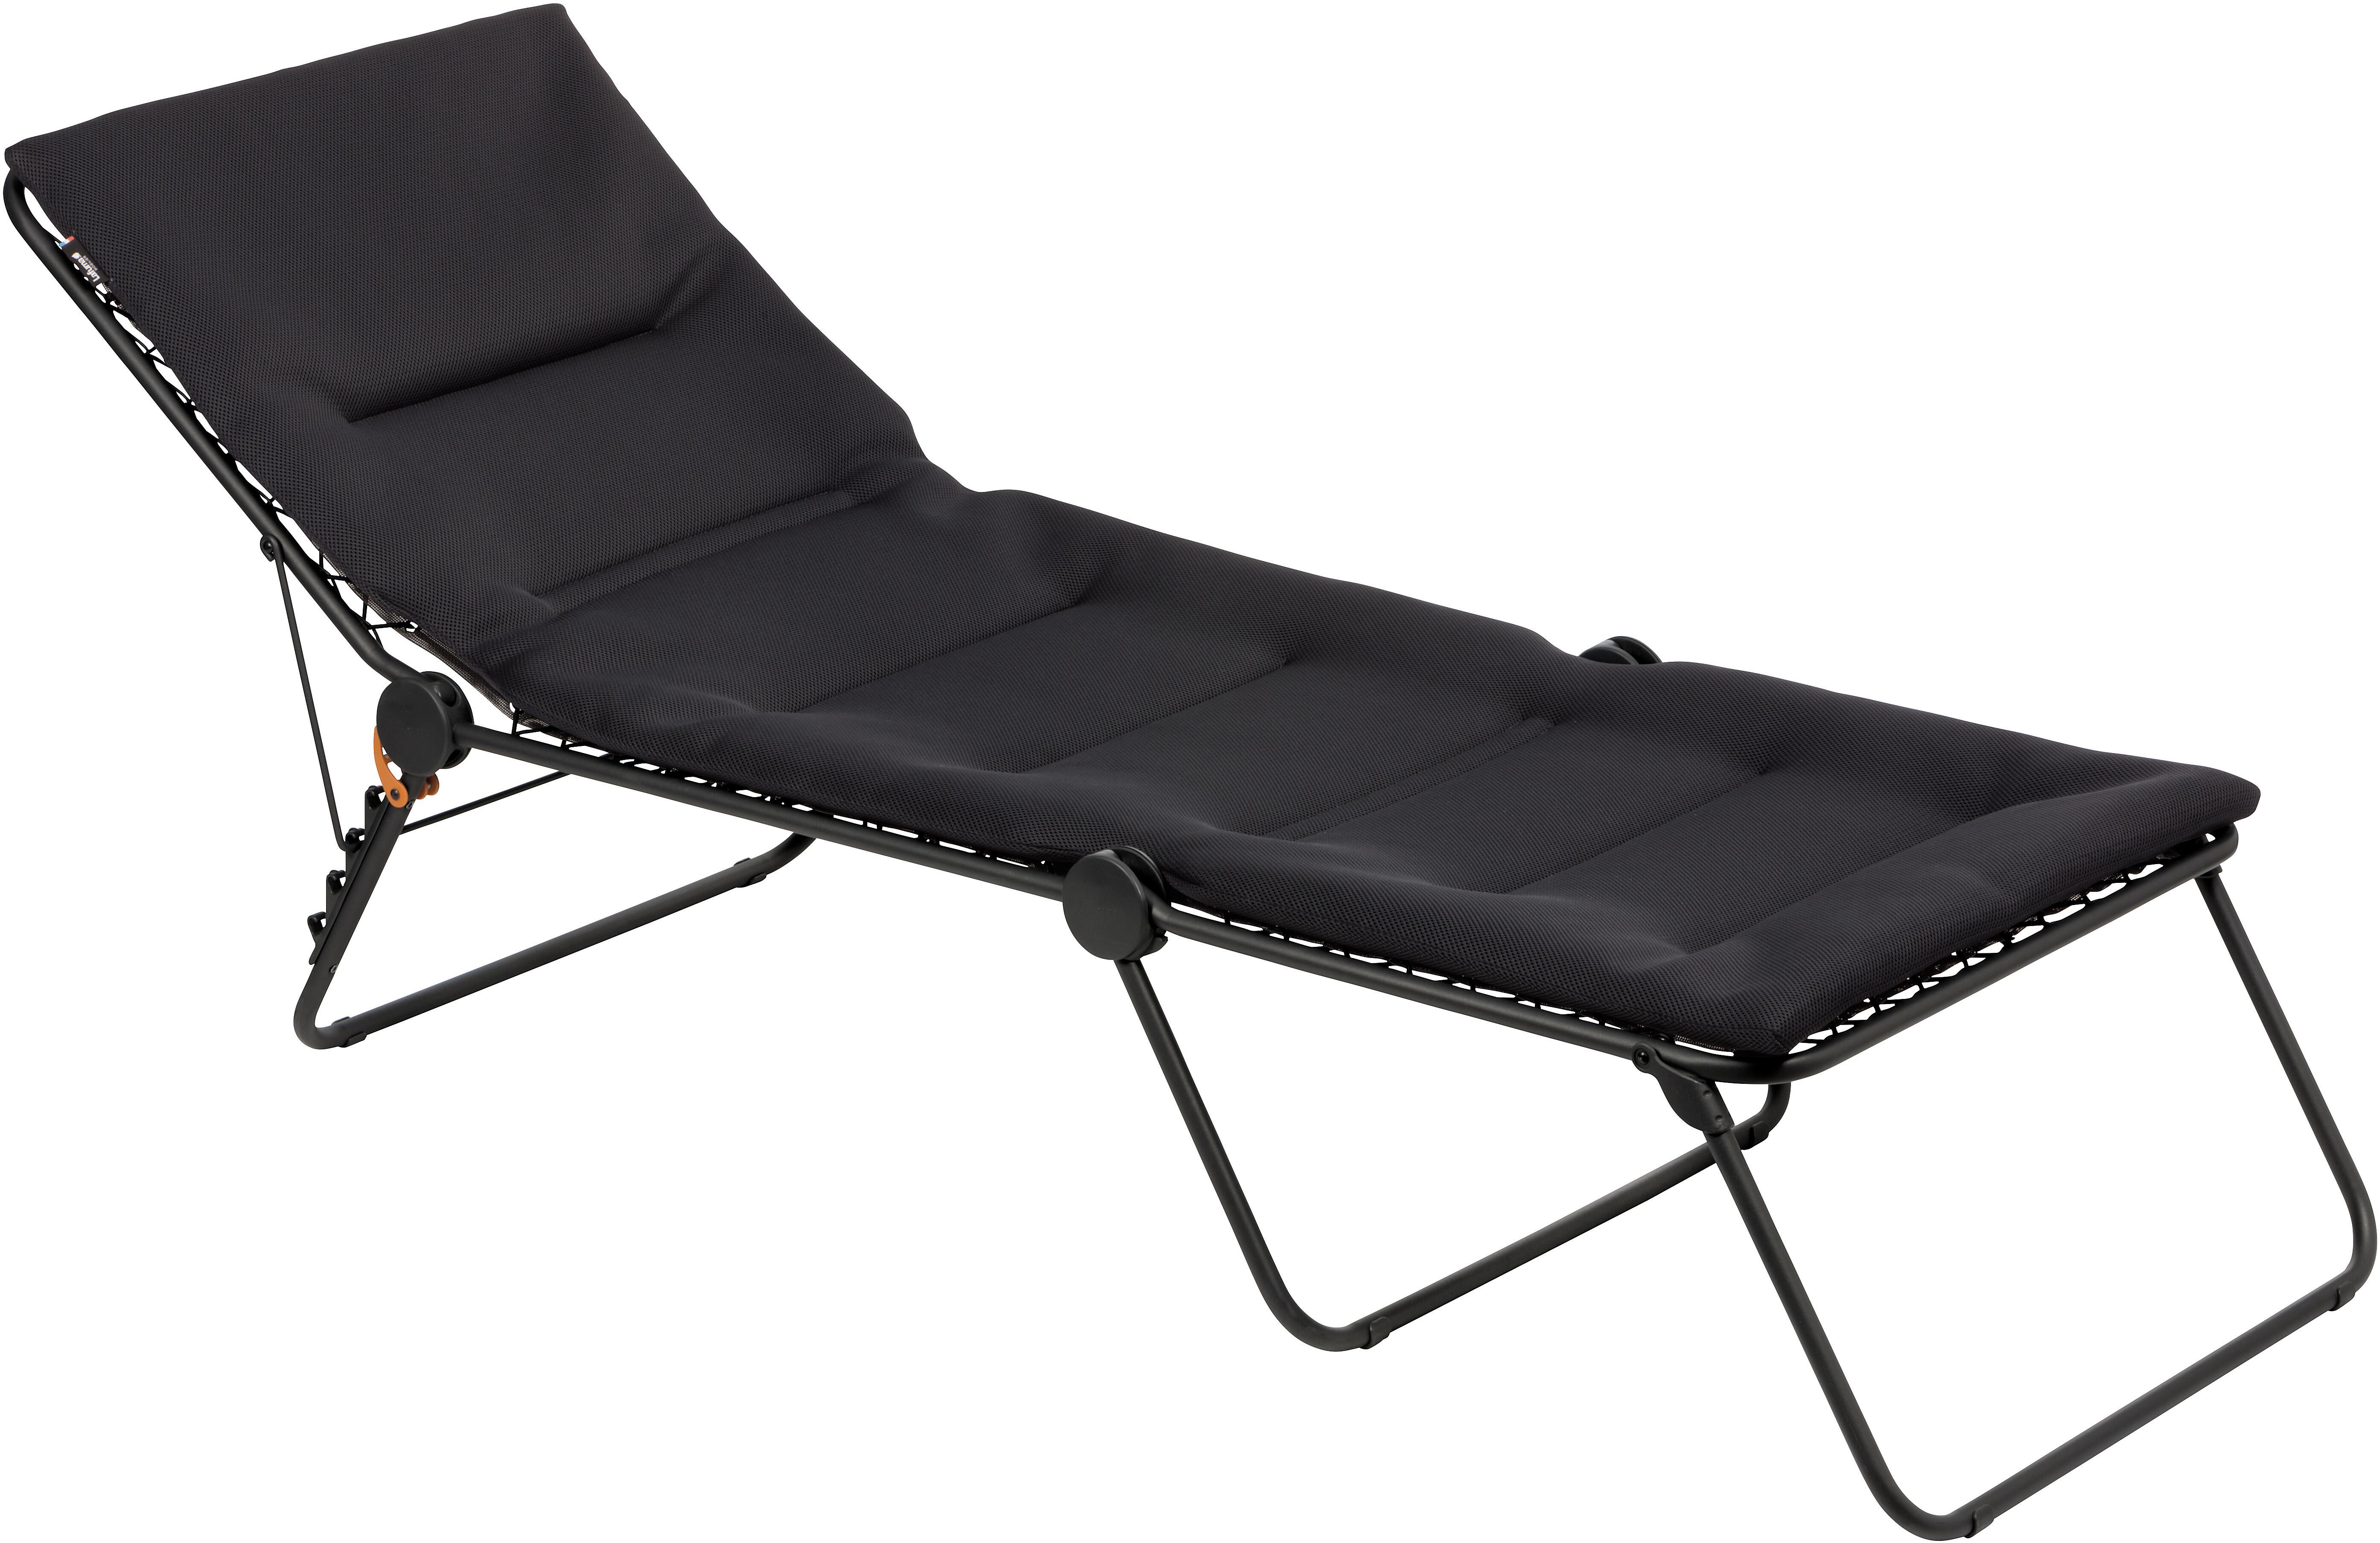 lafuma mobilier siesta l chaise longue air comfort. Black Bedroom Furniture Sets. Home Design Ideas